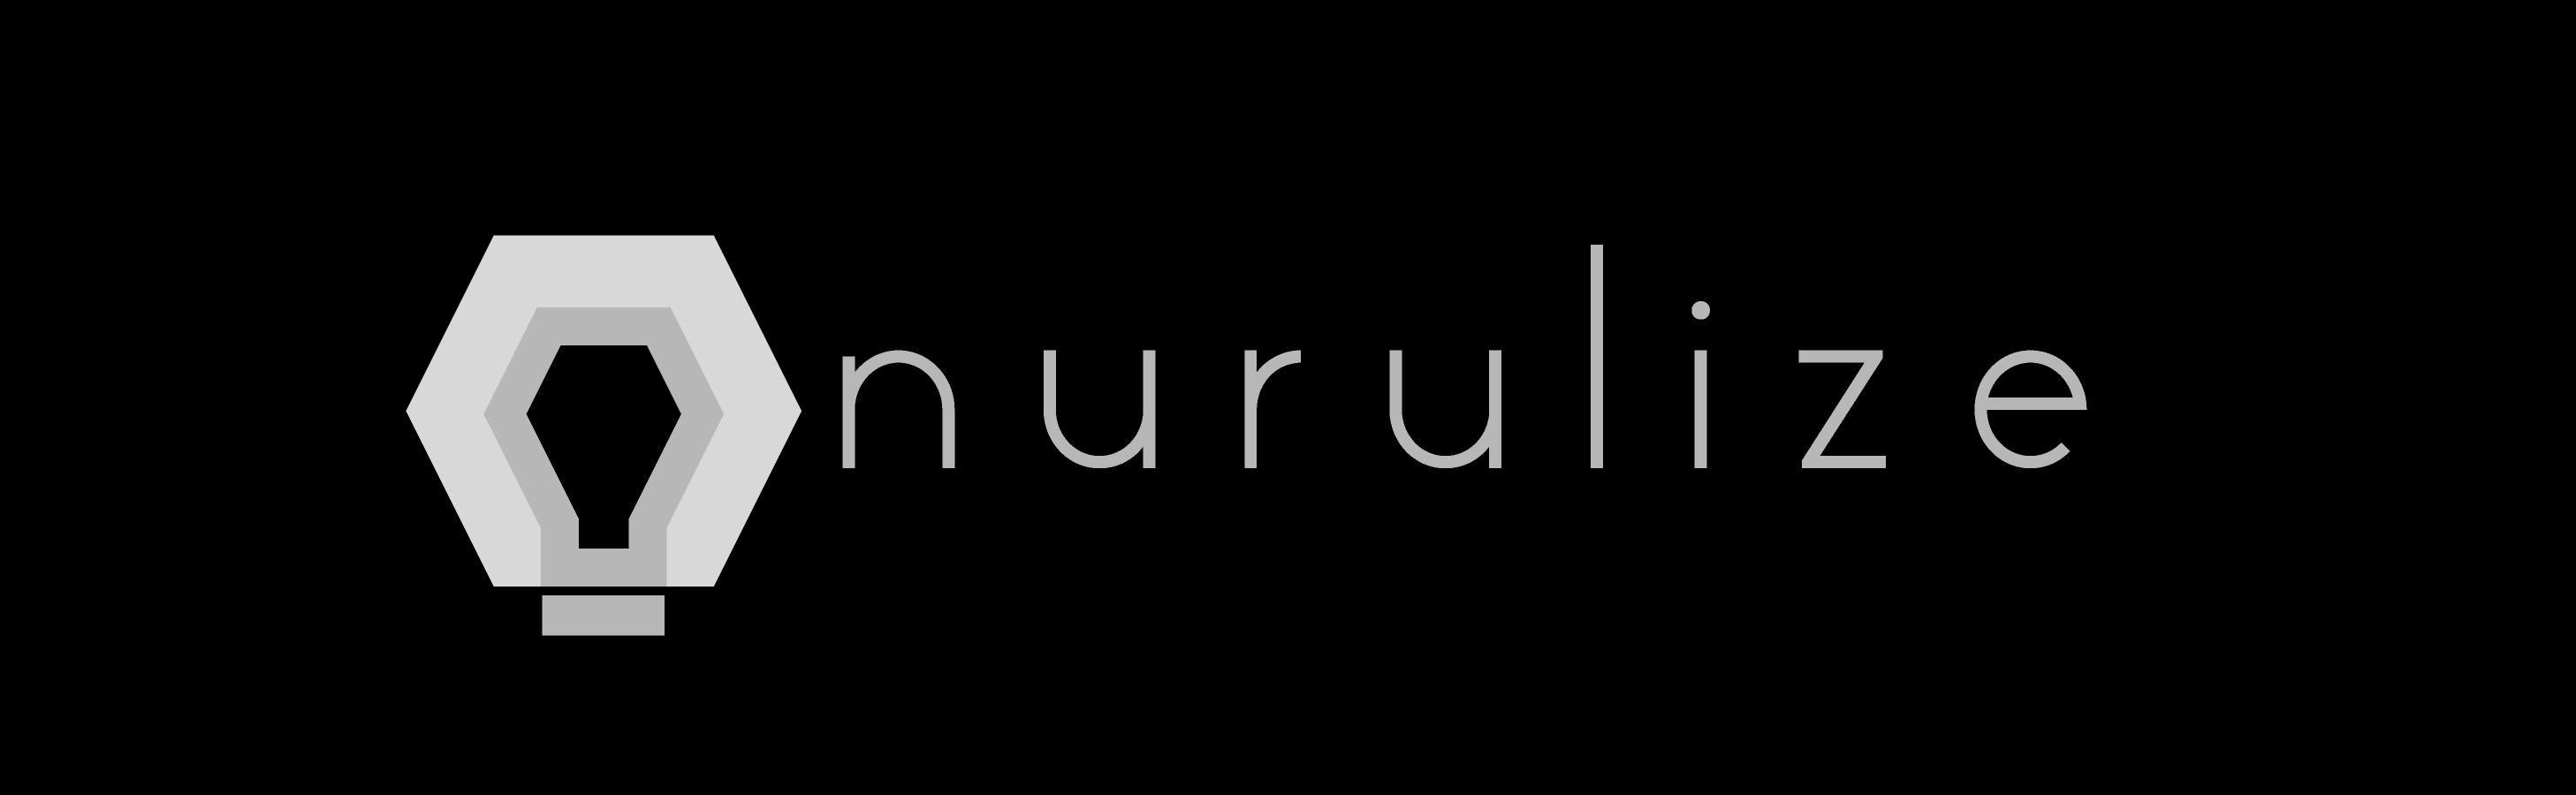 Nurulize's logo